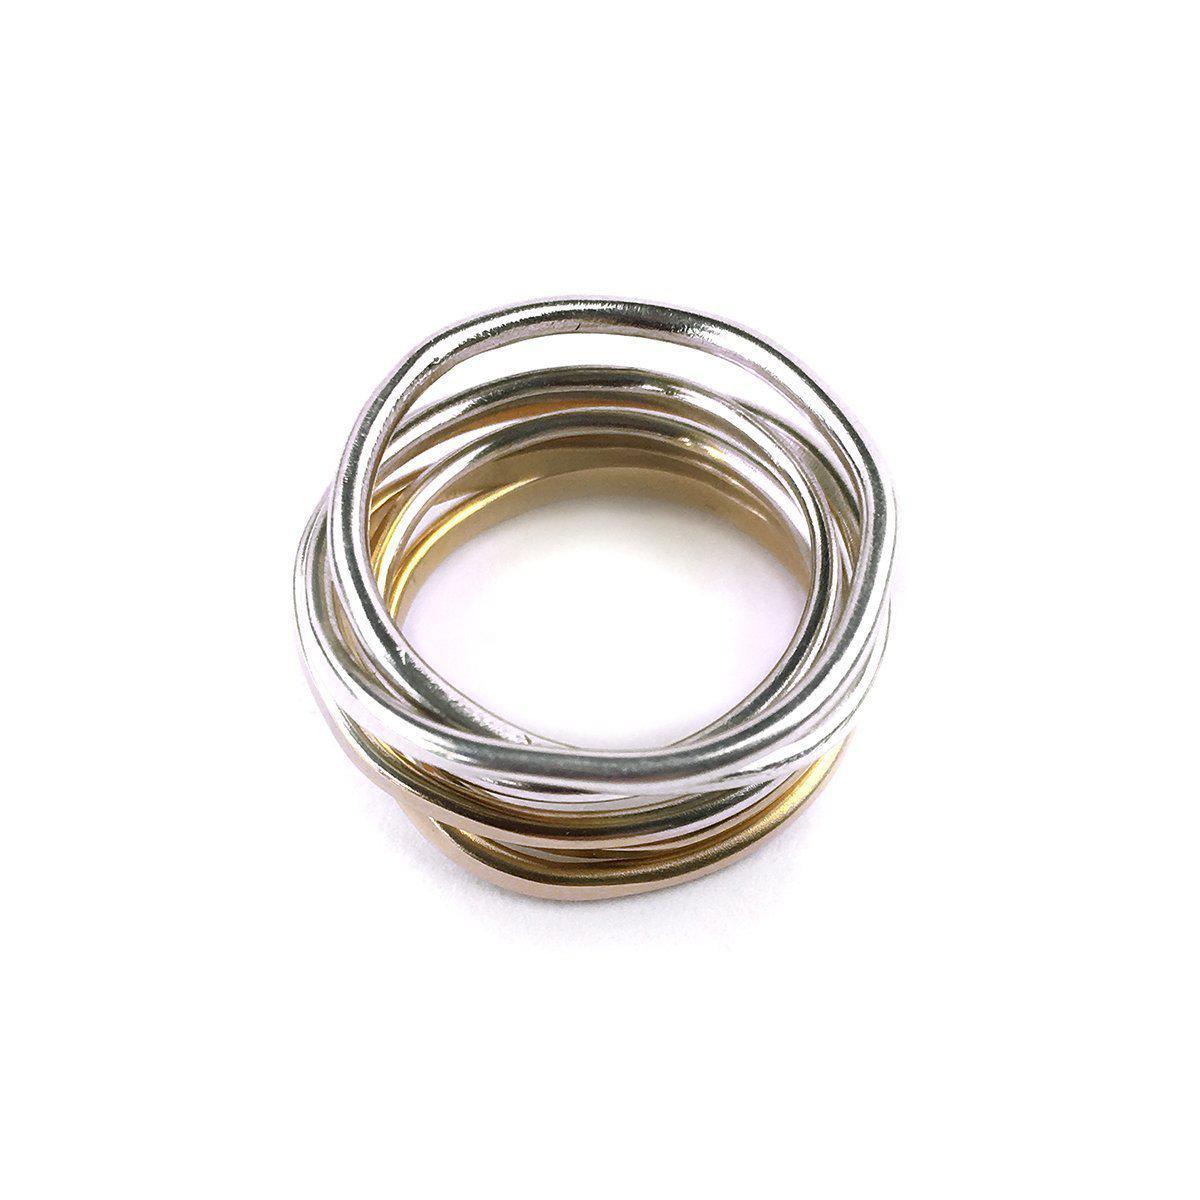 Fran Regan Jewellery Ombre Cosmic Wedding Ring 6 Tier - UK K 1/2 - US 5 3/8 - EU 51 1/4 1vZEvW0e39